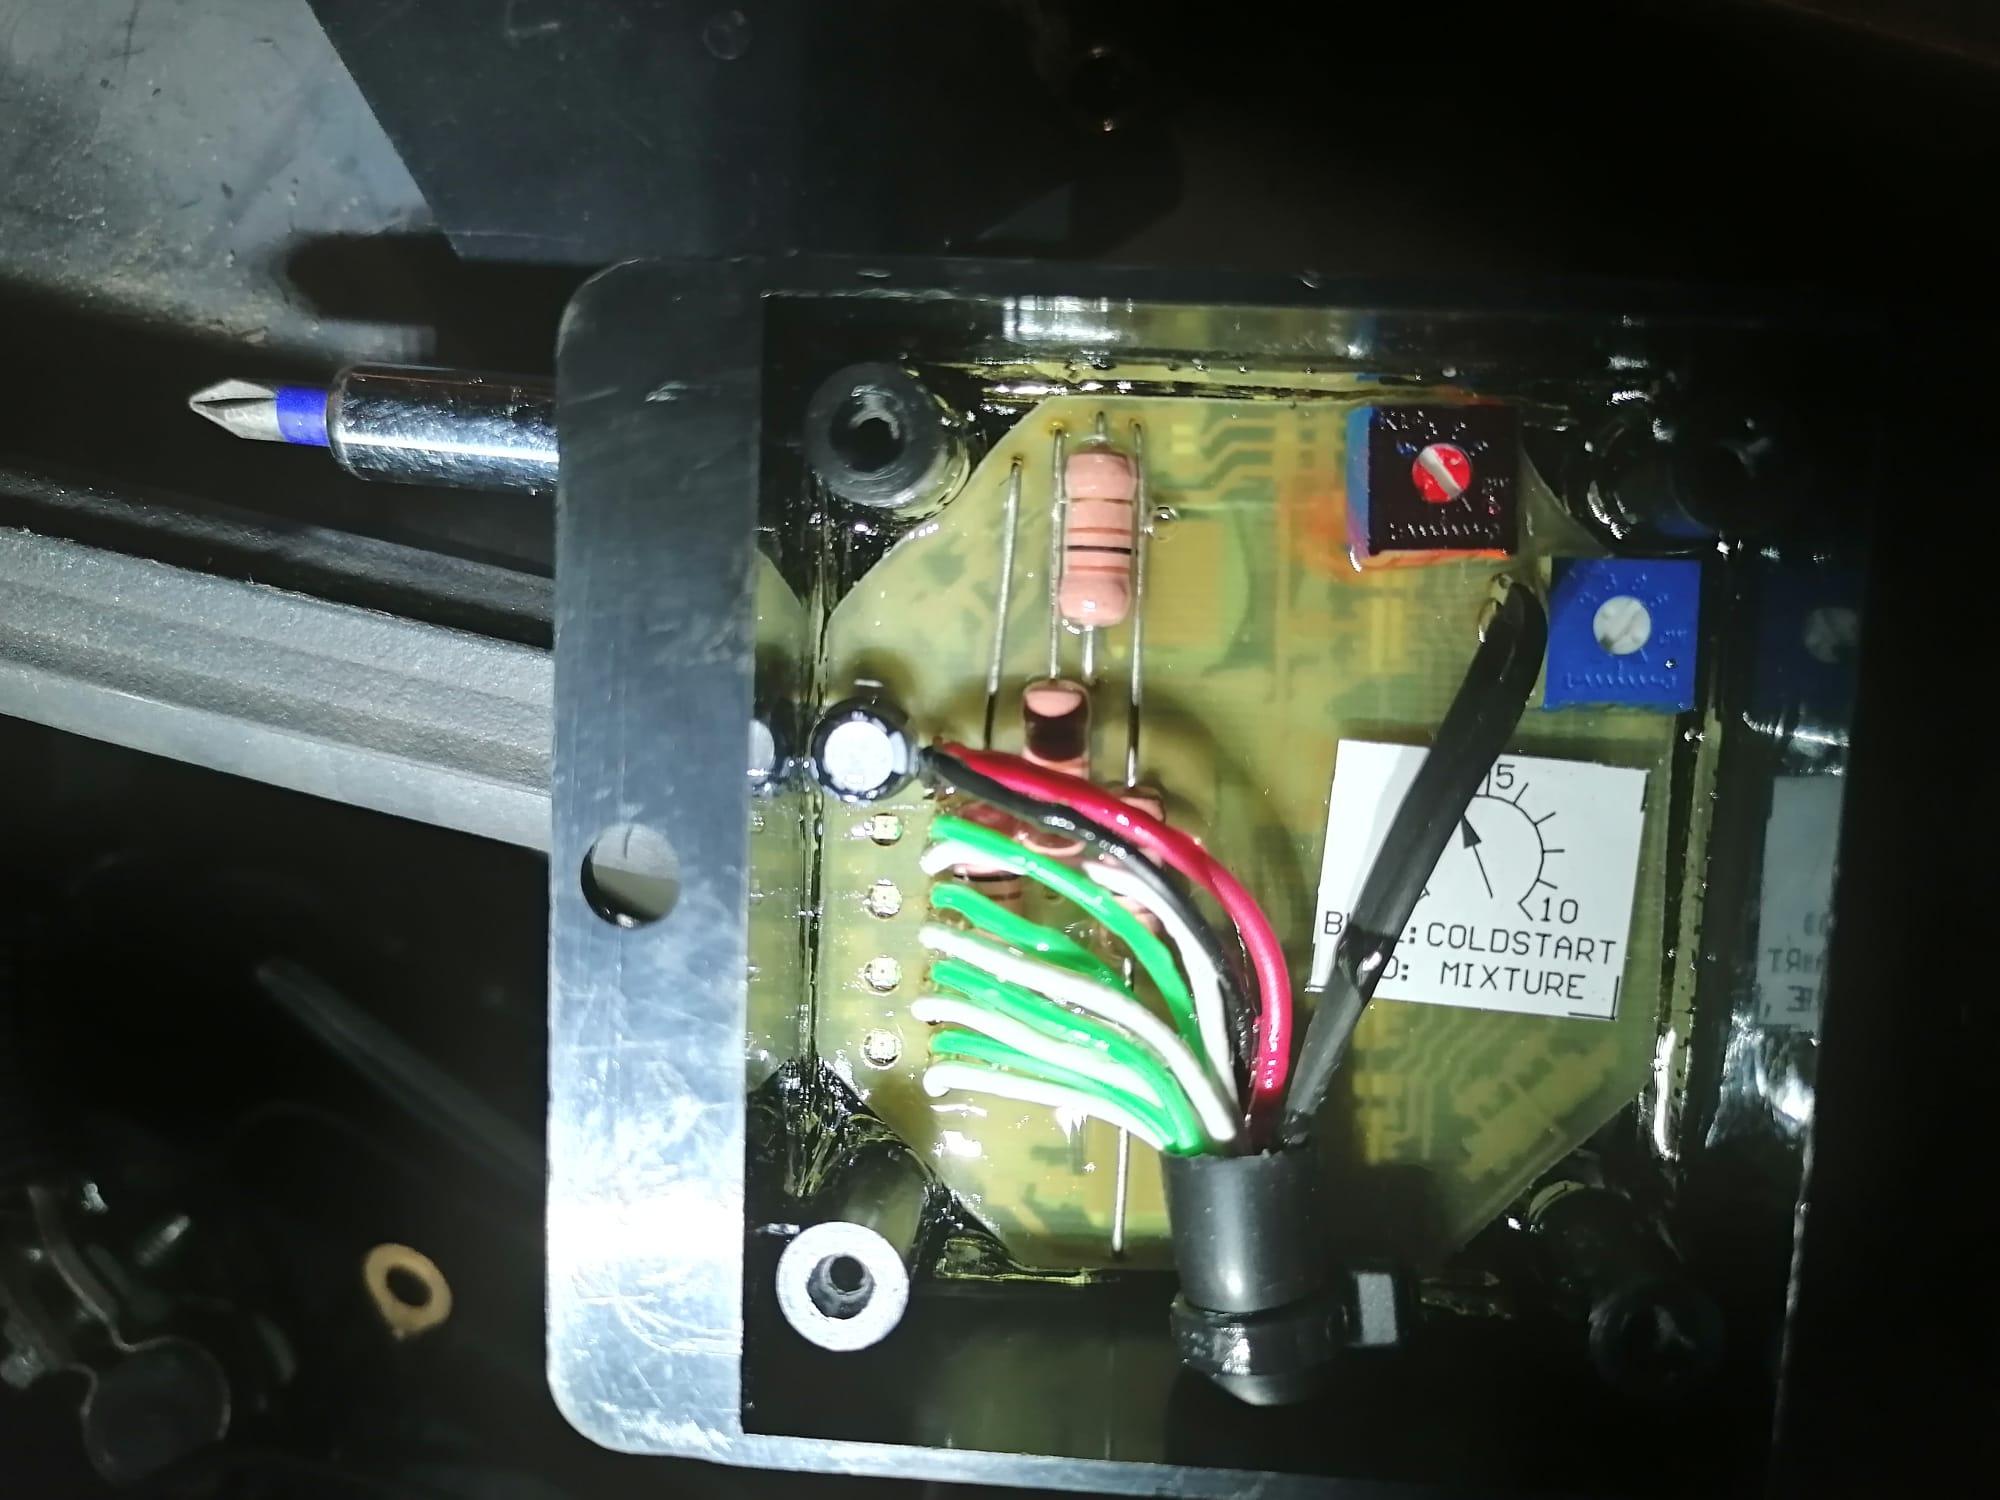 [TUTO] Vidéo comment installer le kit e85 v2 d'Eco-System A91-D9075-6-B35-409-C-8-D21-550-FBD72-A9-DE